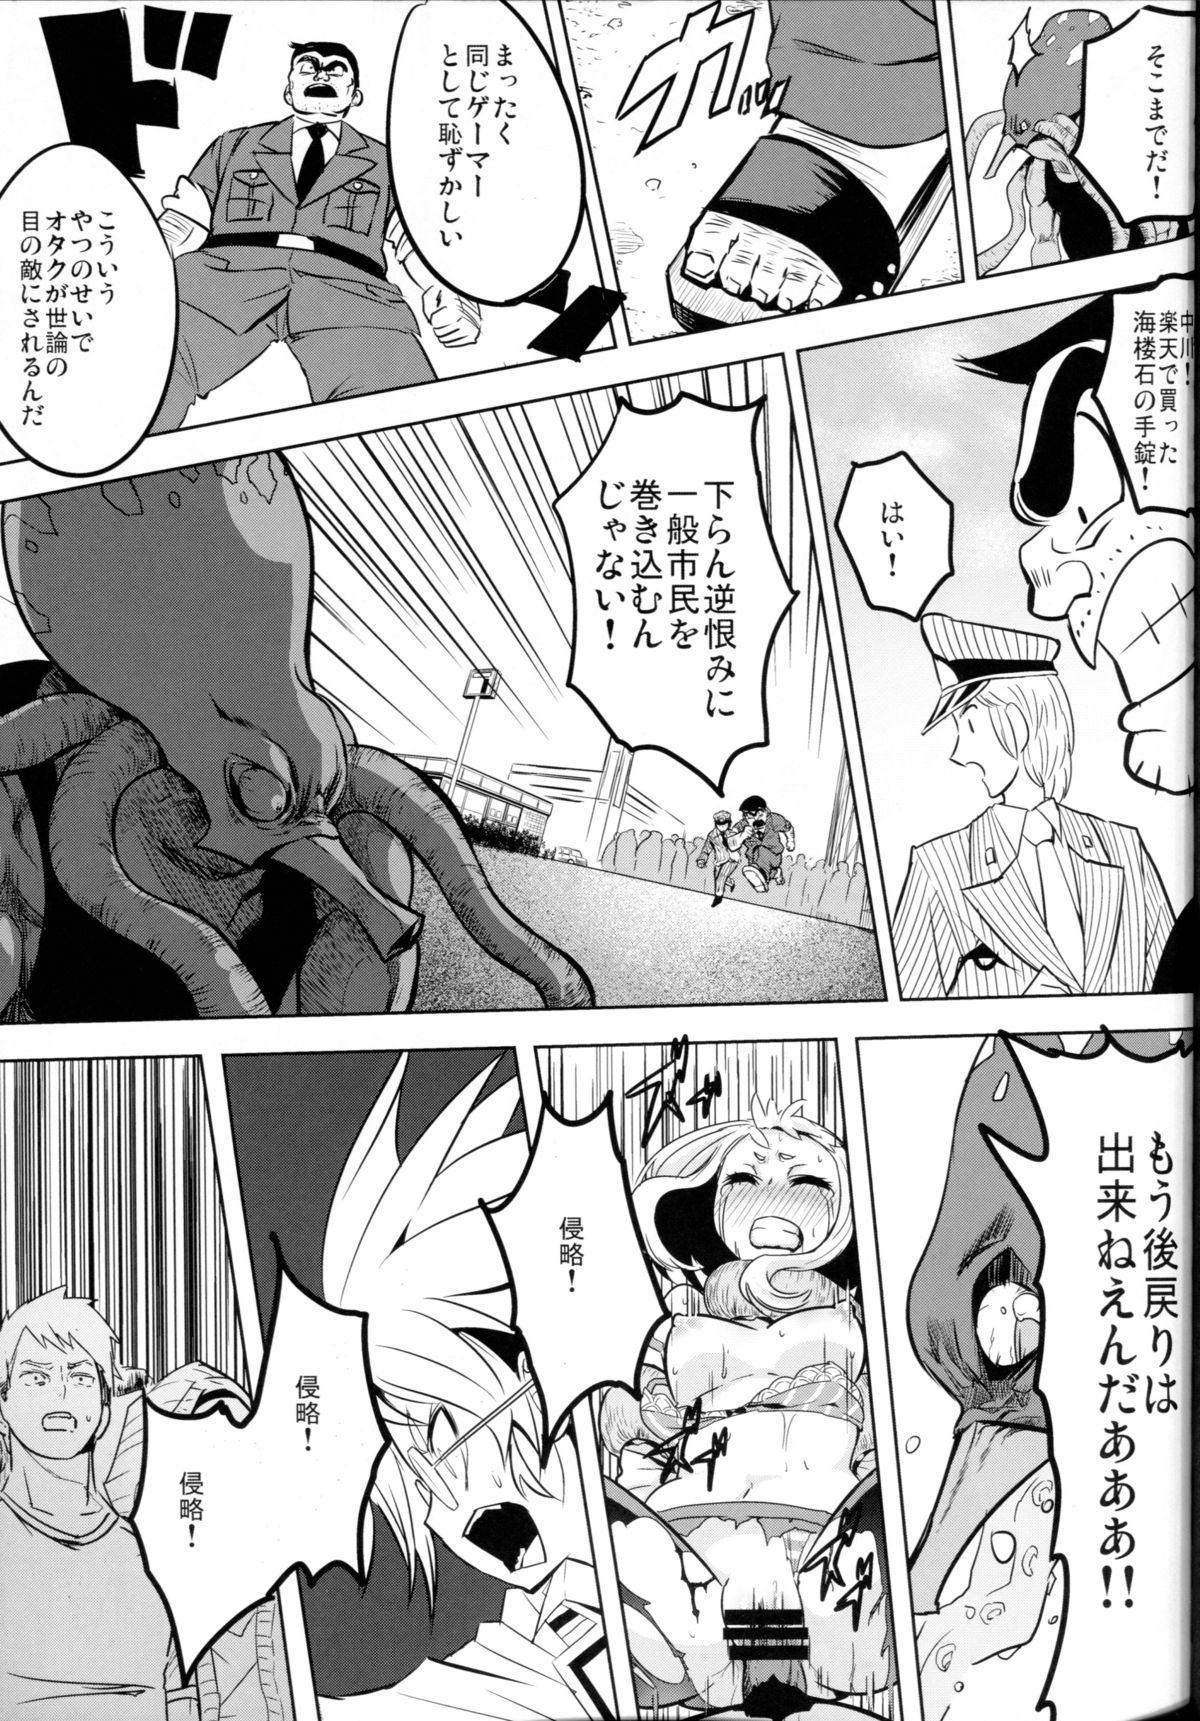 Saredo Uraraka ni! Ikari no Gachimacchi - Still Behave Uraraka! 20